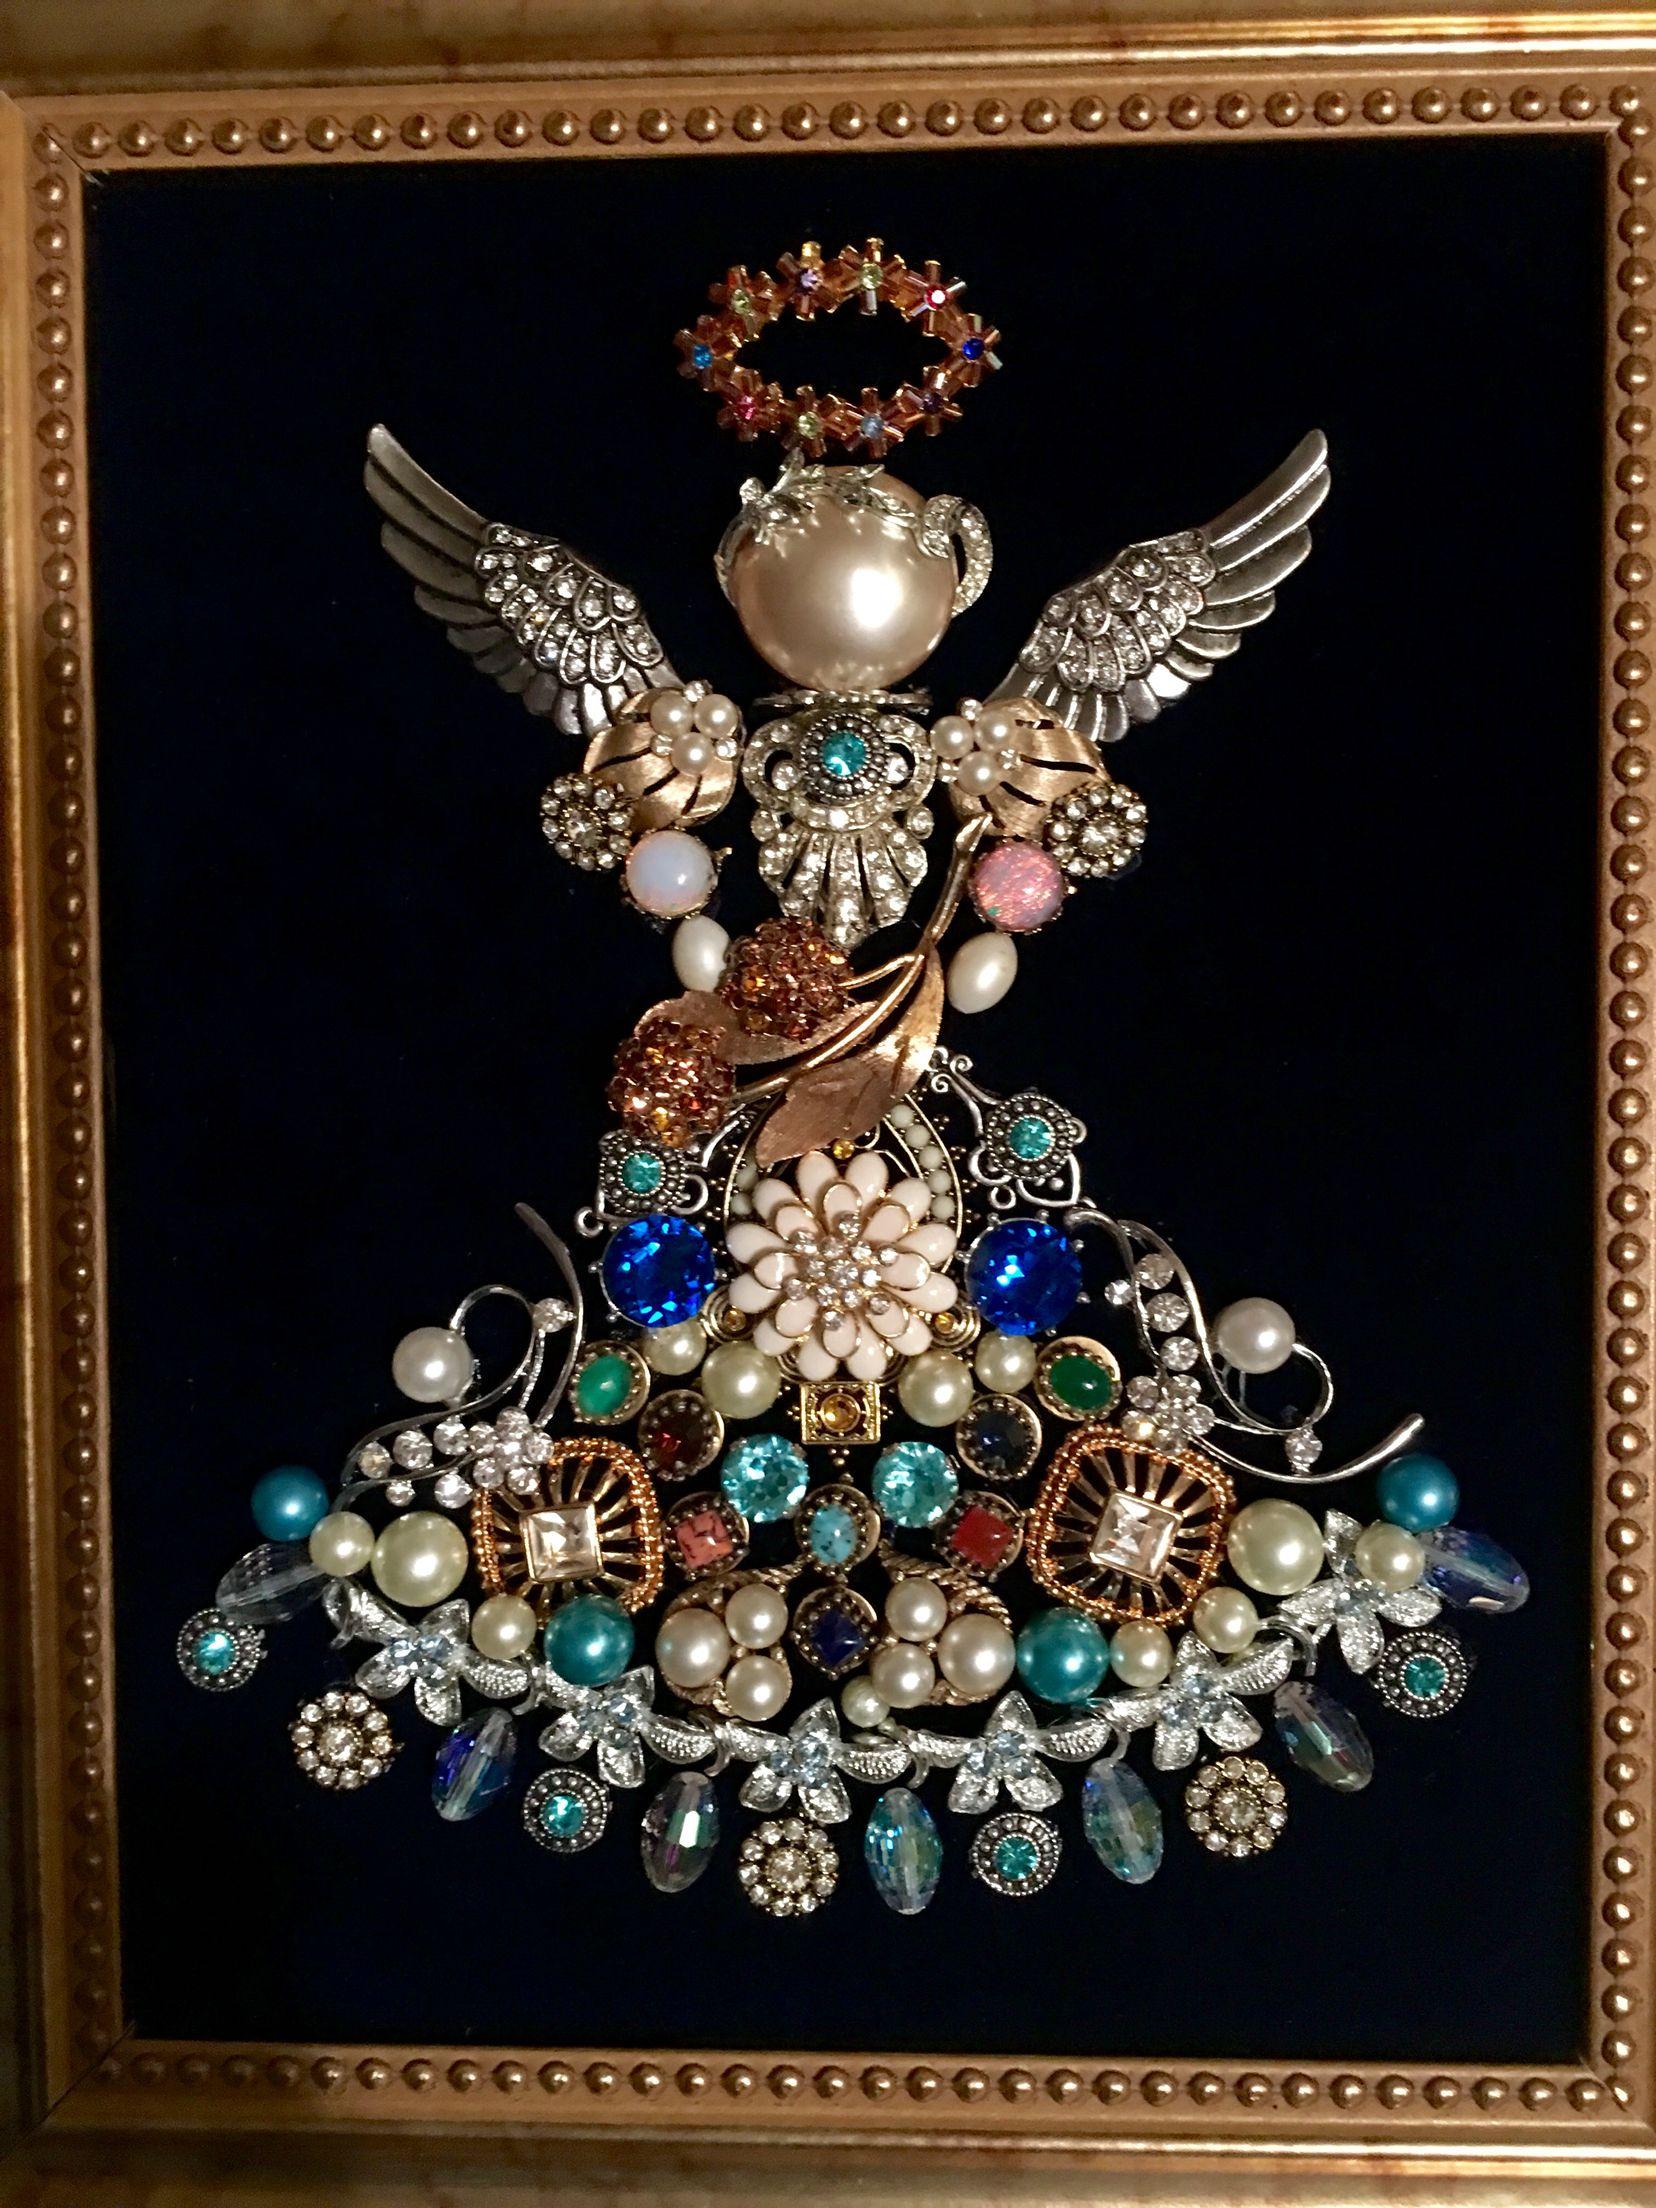 Angel Beth Turchi 2015 Vintage Jewelry Creations